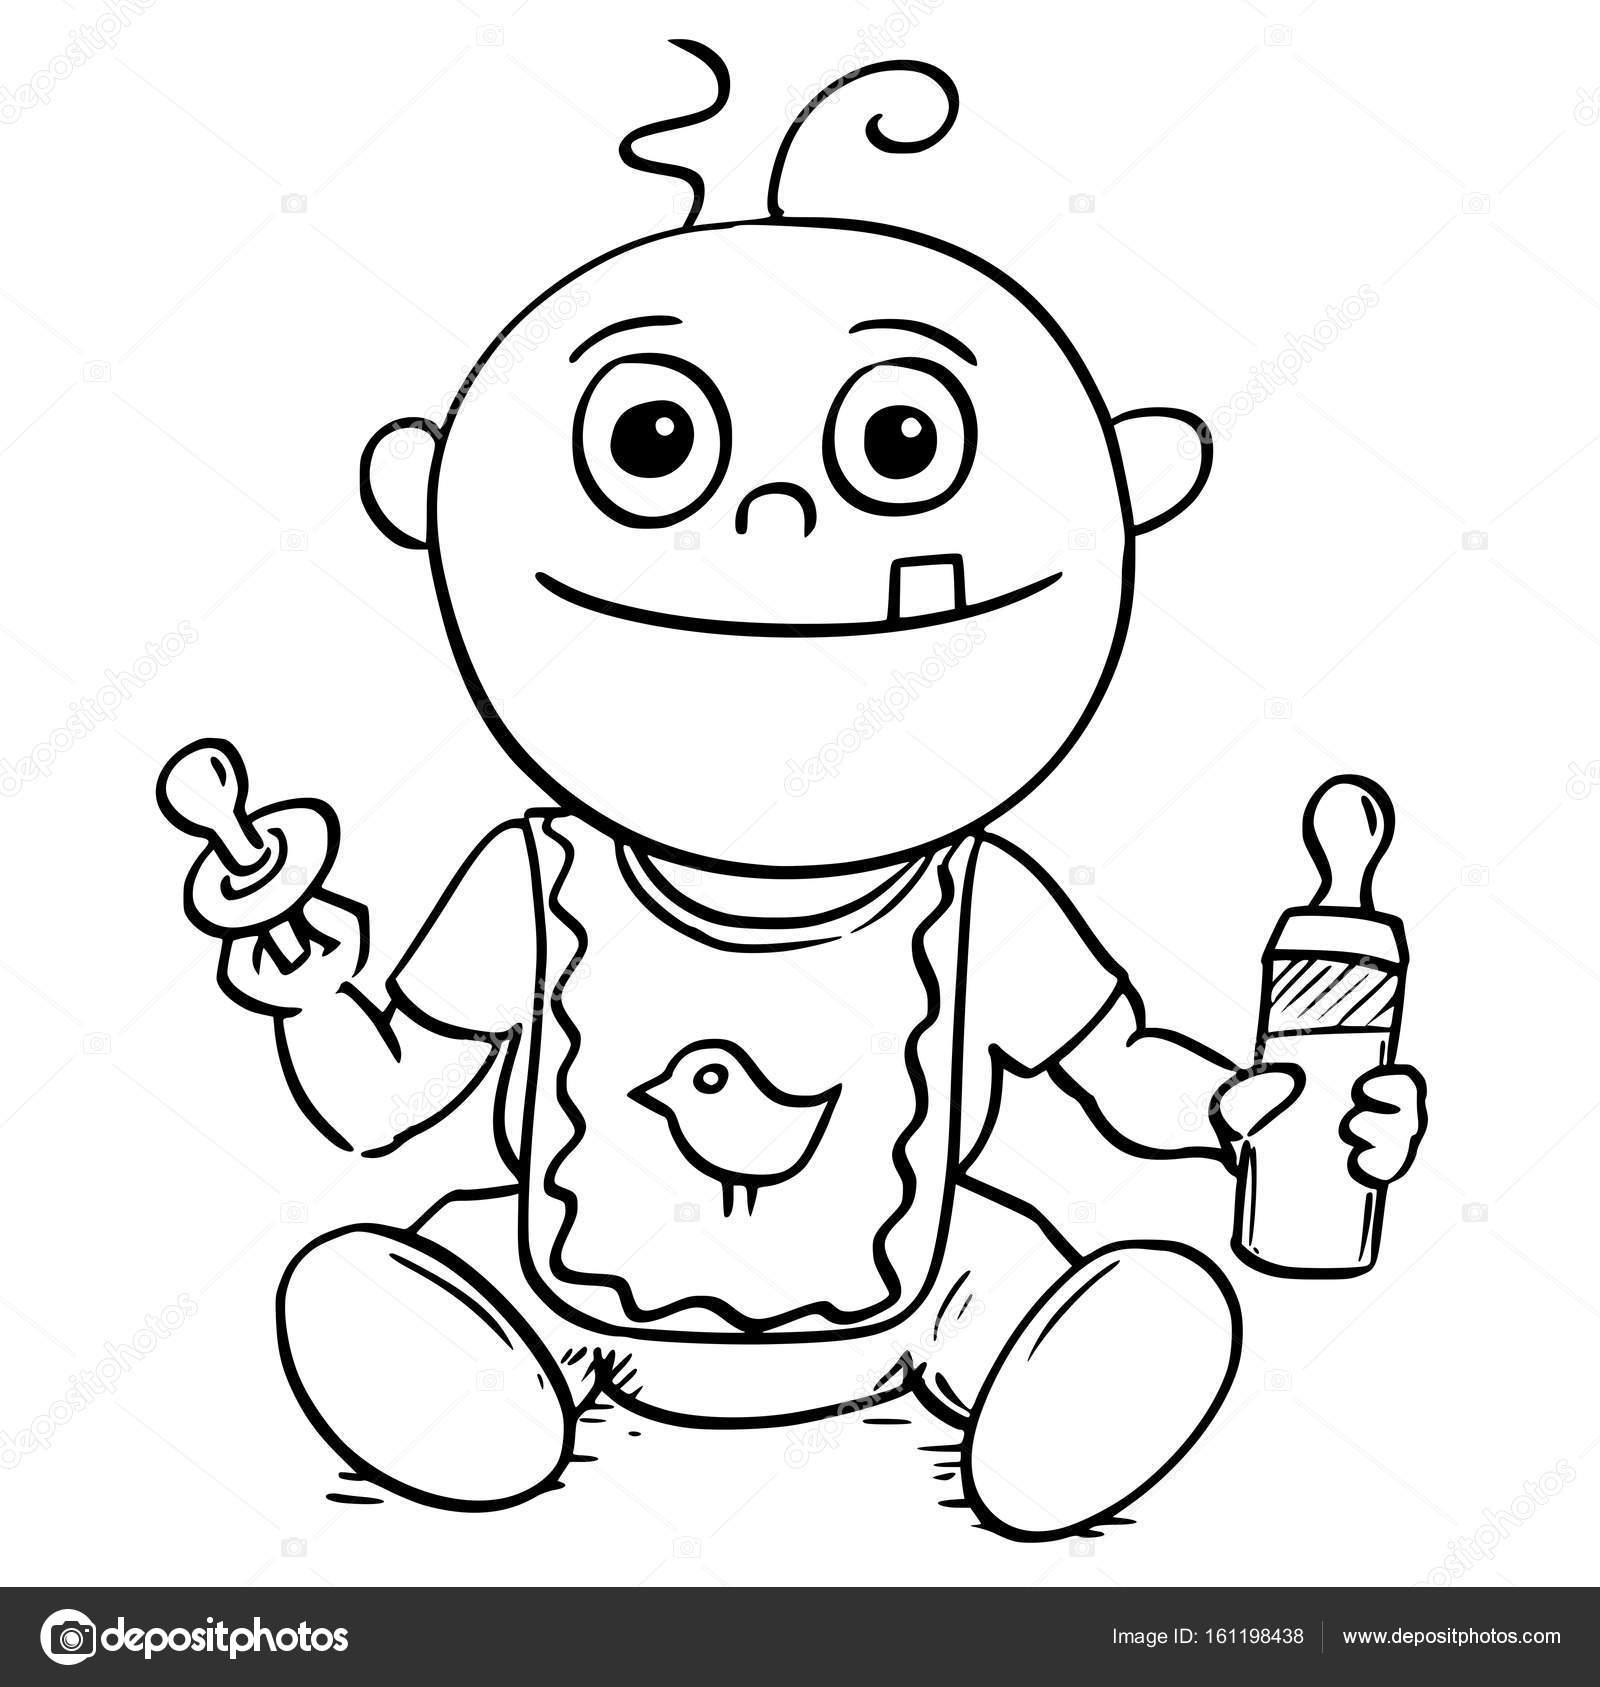 Illustration de dessin anim de b b avec t tine factice - Dessin sucette bebe ...